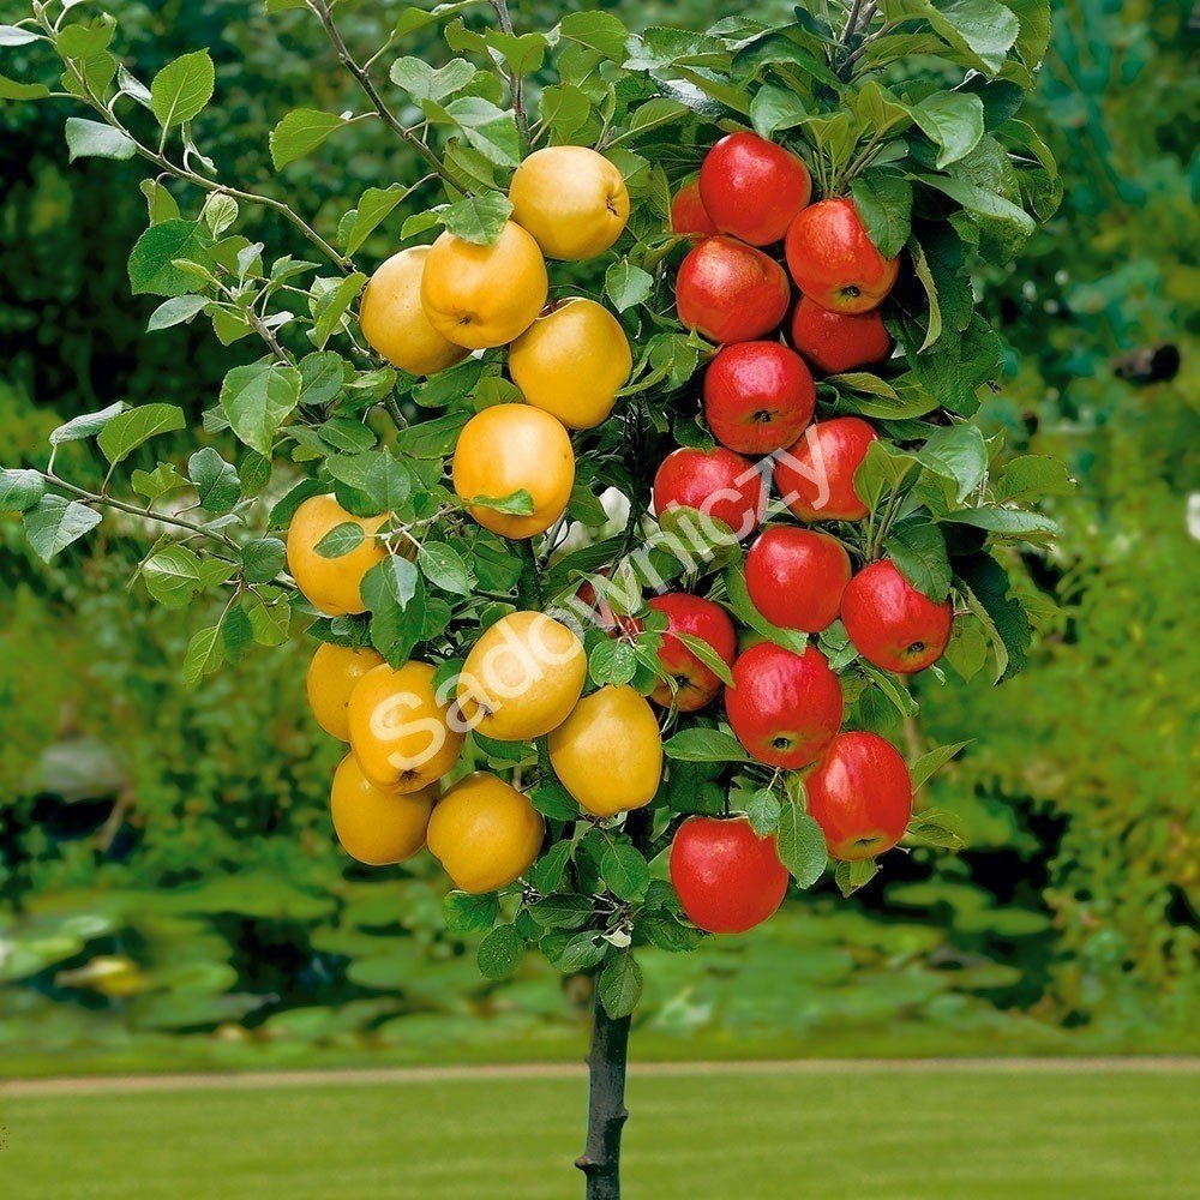 jabłoń Braeburn Bramley